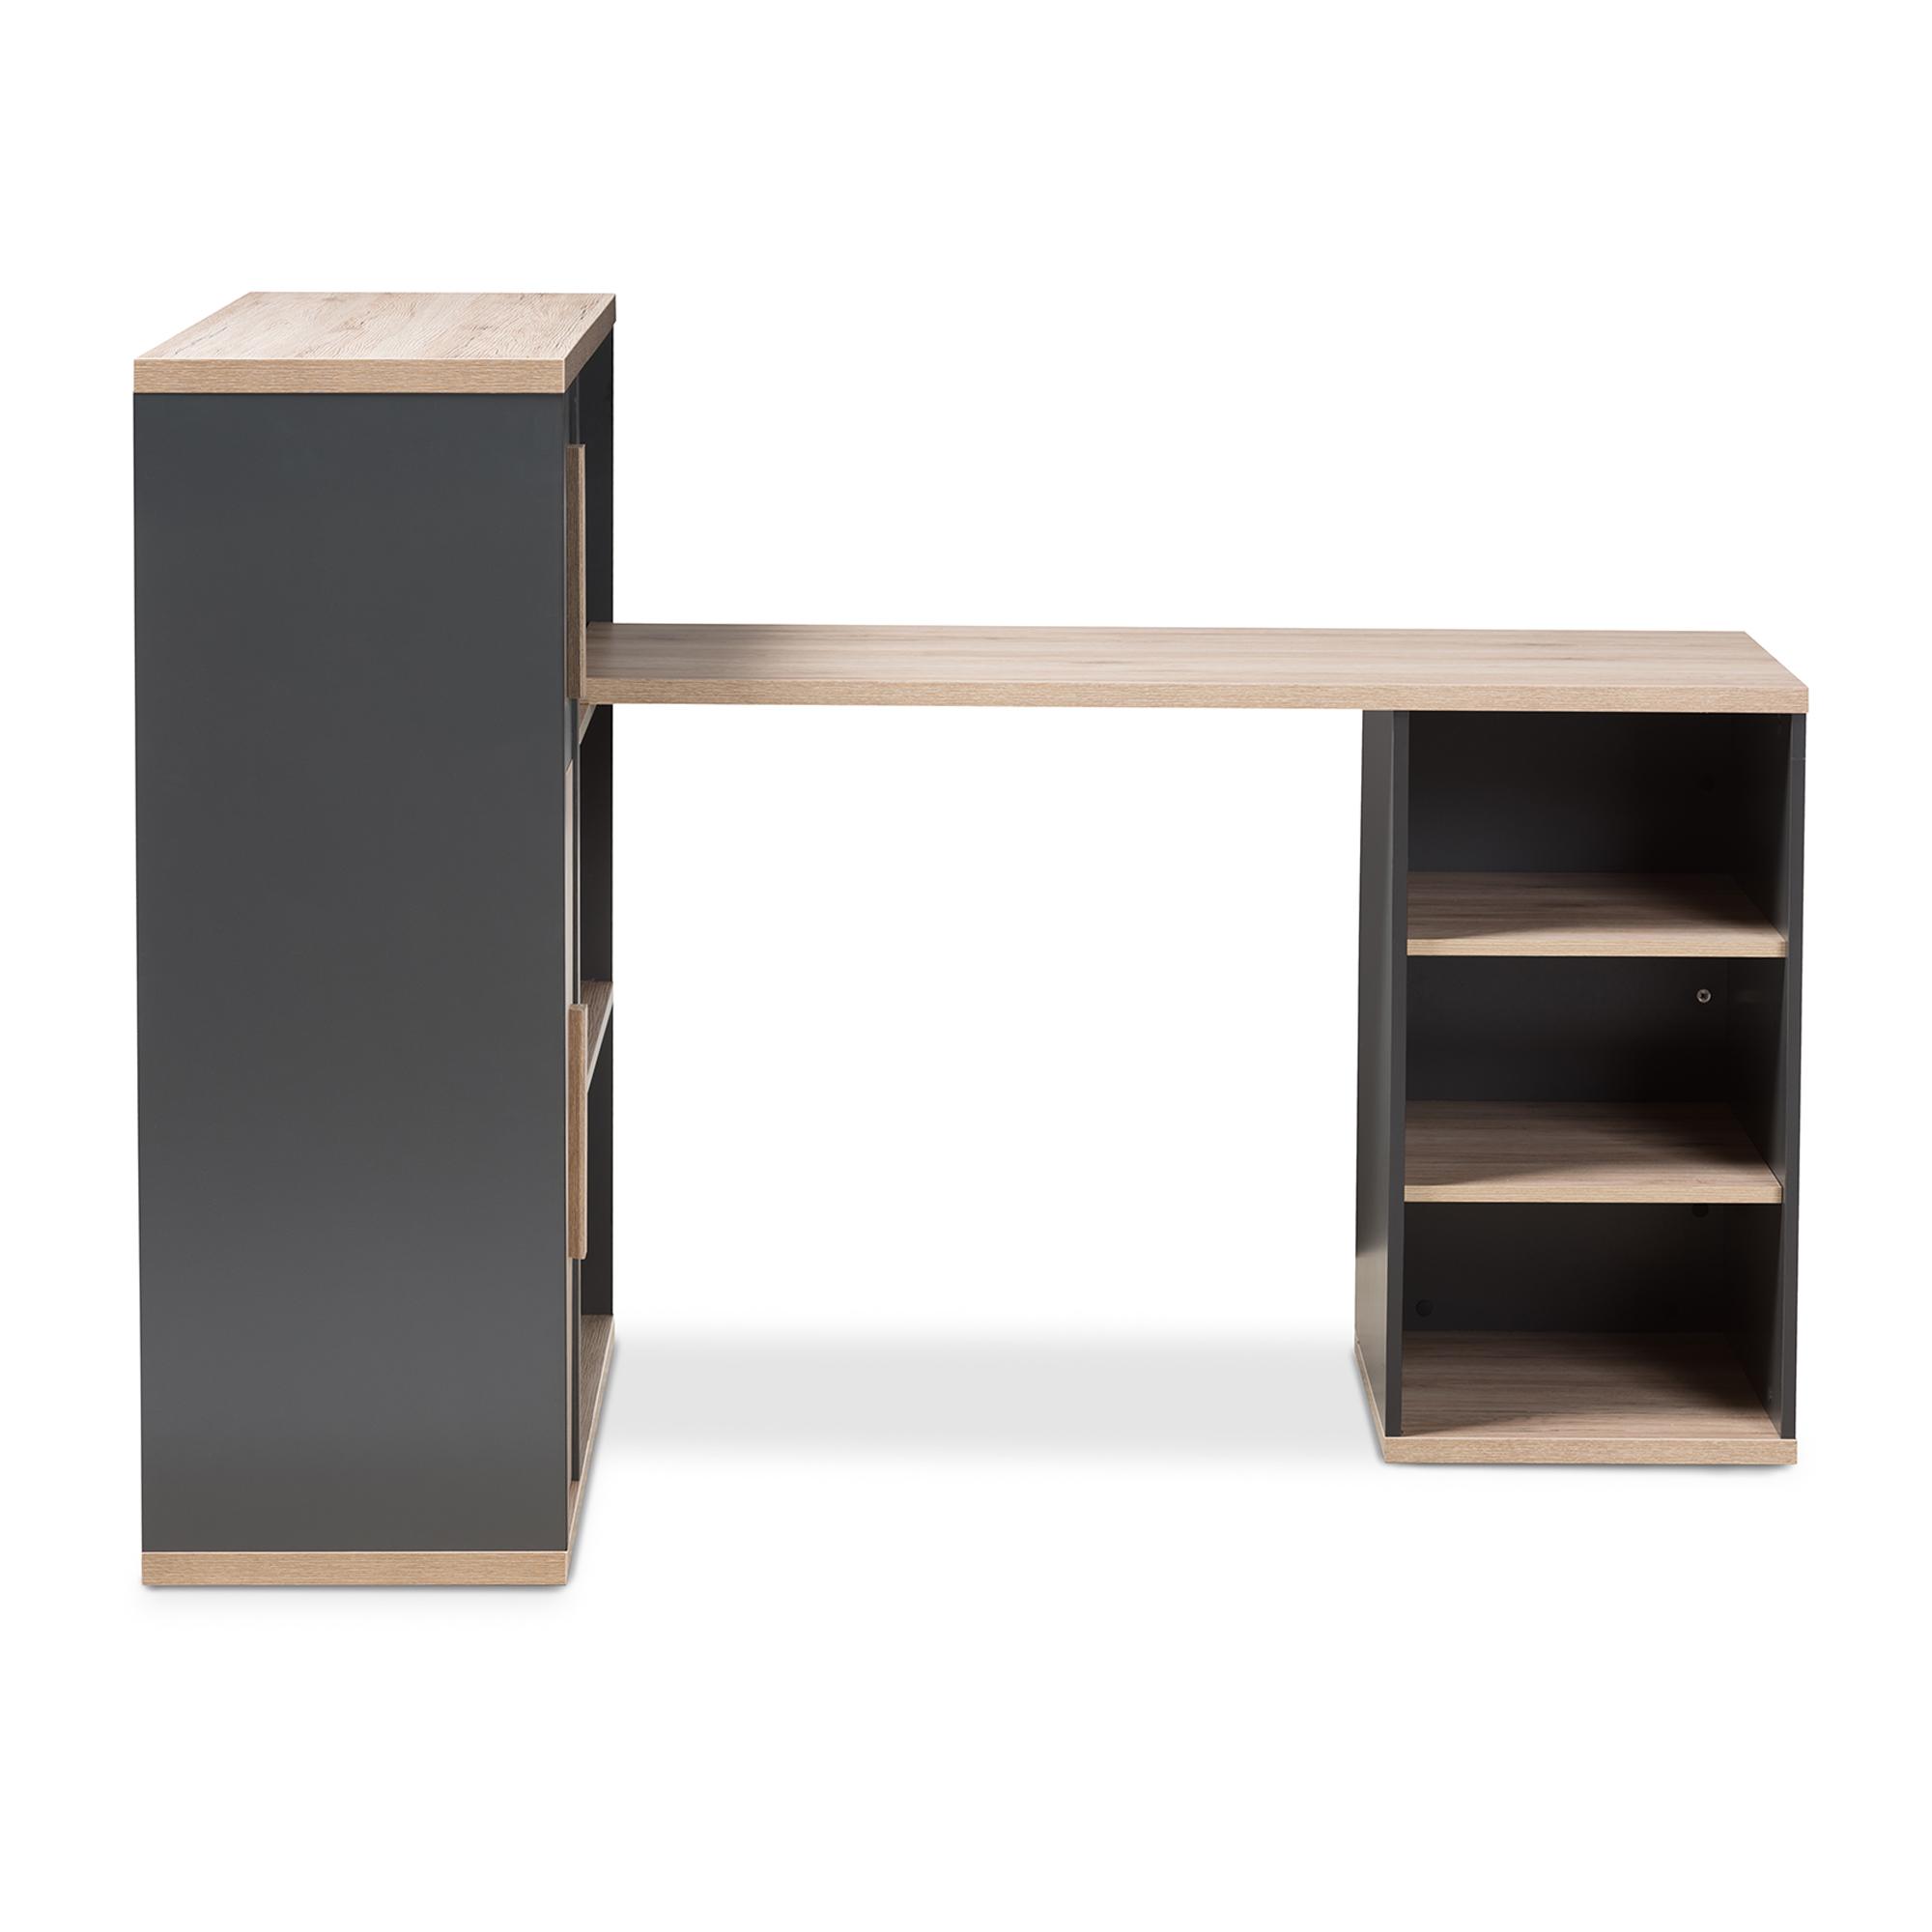 ... Baxton Studio Pandora Modern And Contemporary Dark Grey And Light Brown  Two Tone Study Desk ...